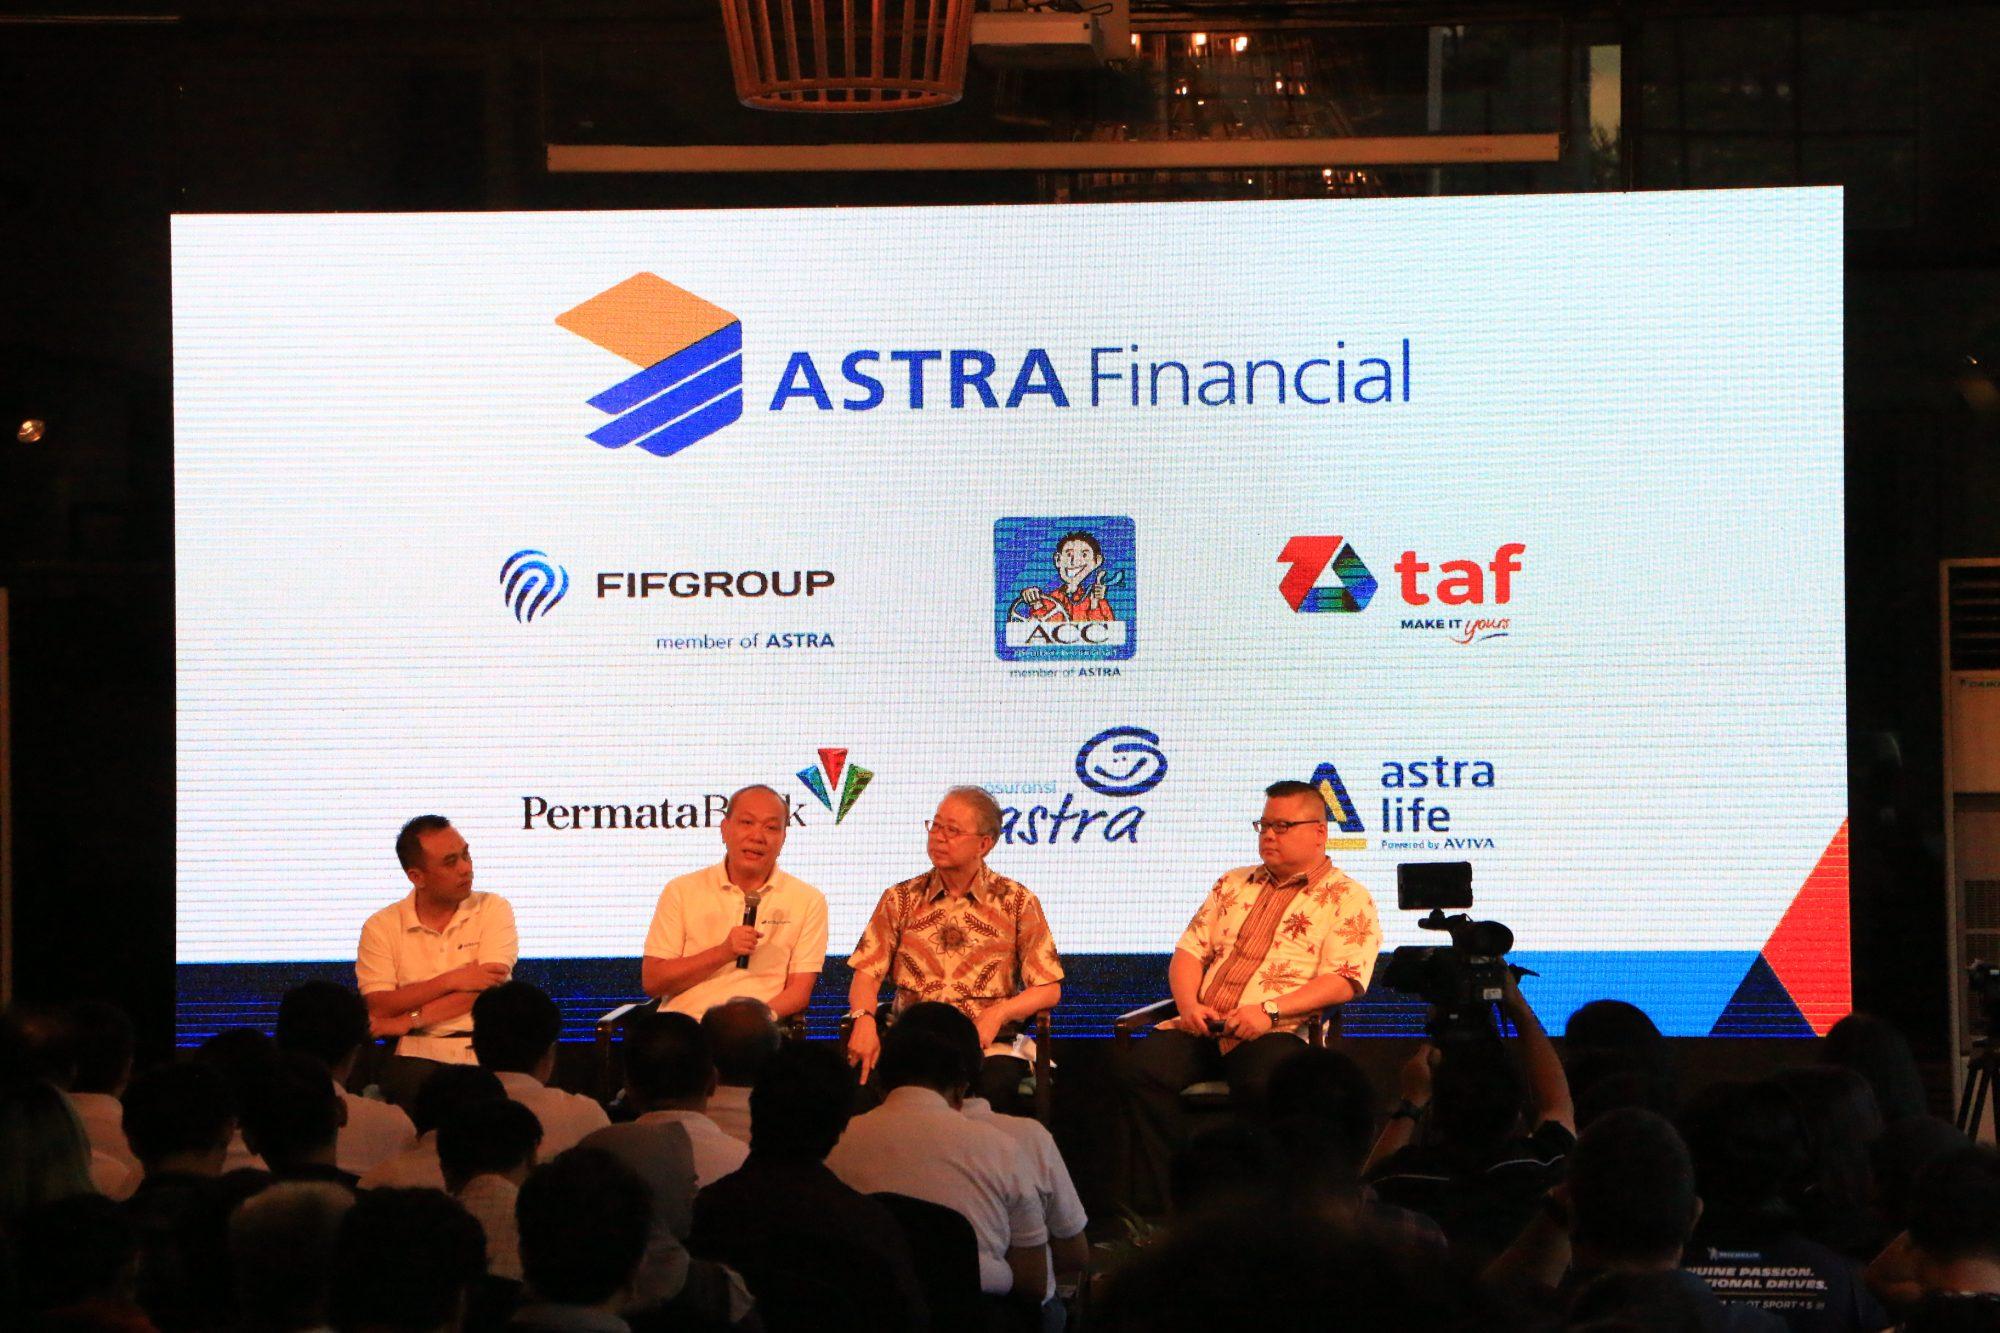 Astra Financial Dukung Industri Otomotif Nasional Lewat GIIAS 2018